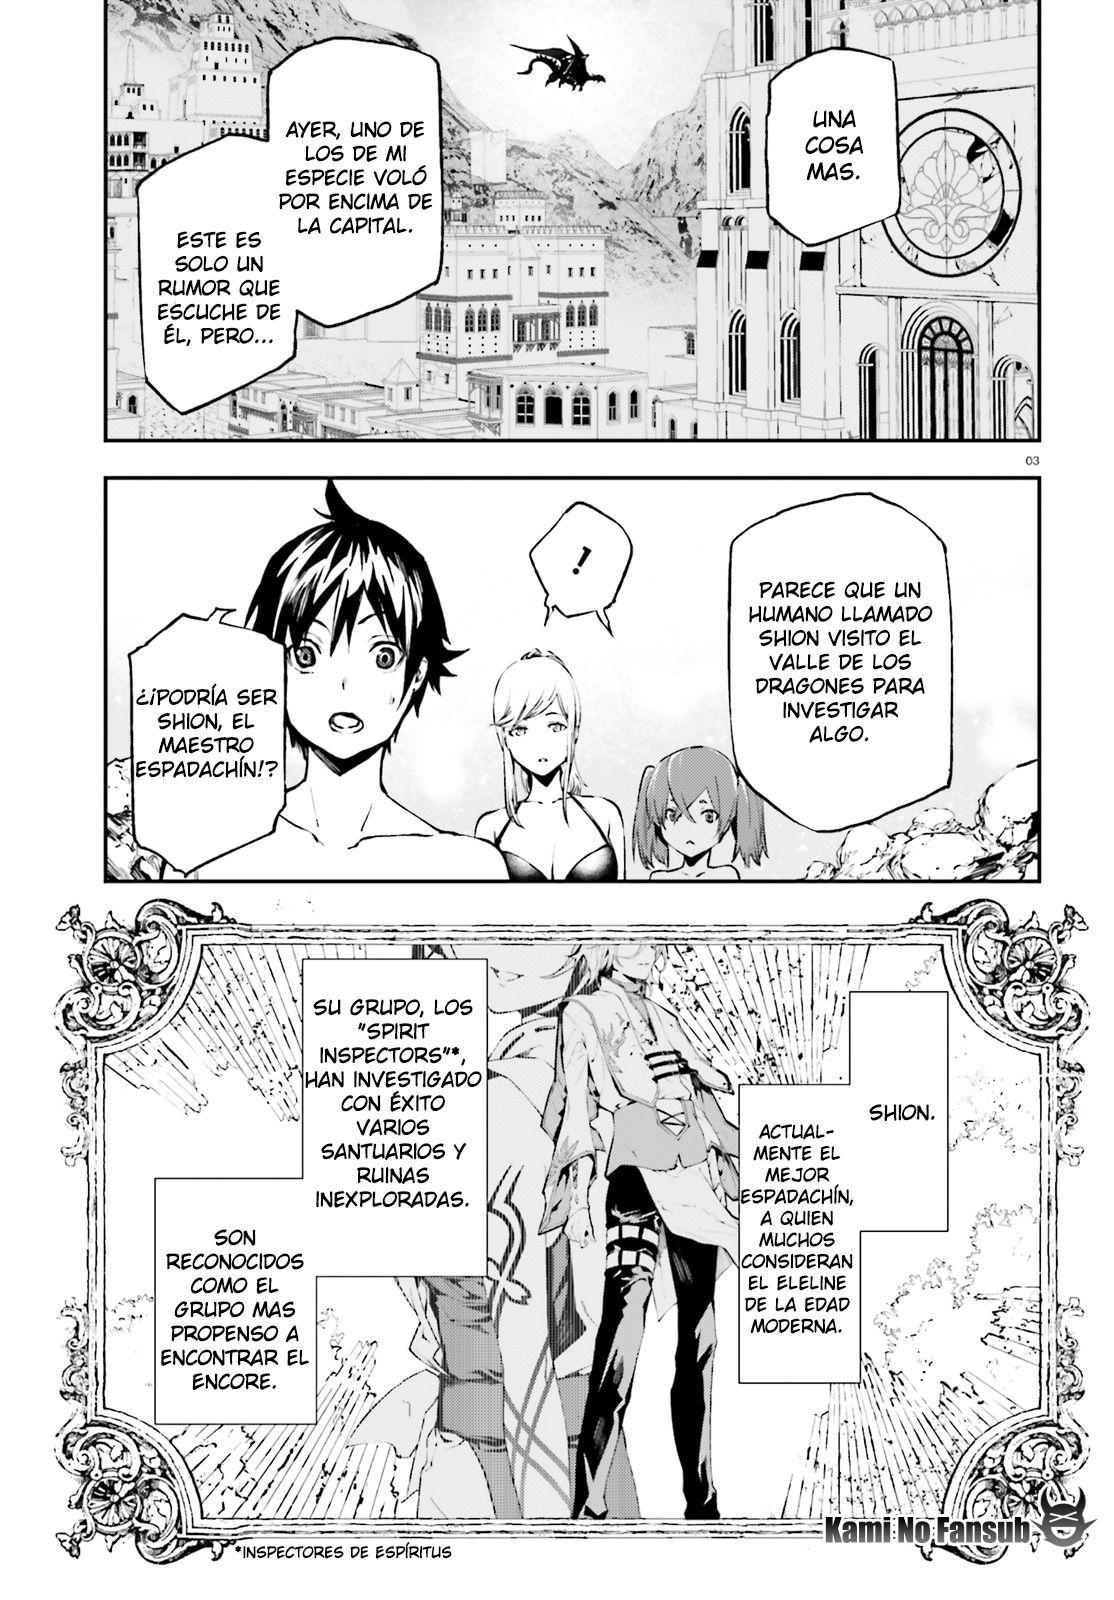 https://c5.ninemanga.com/es_manga/pic2/48/18352/524756/7c1d29f0df3a9eba77951cd8222b08a0.jpg Page 4